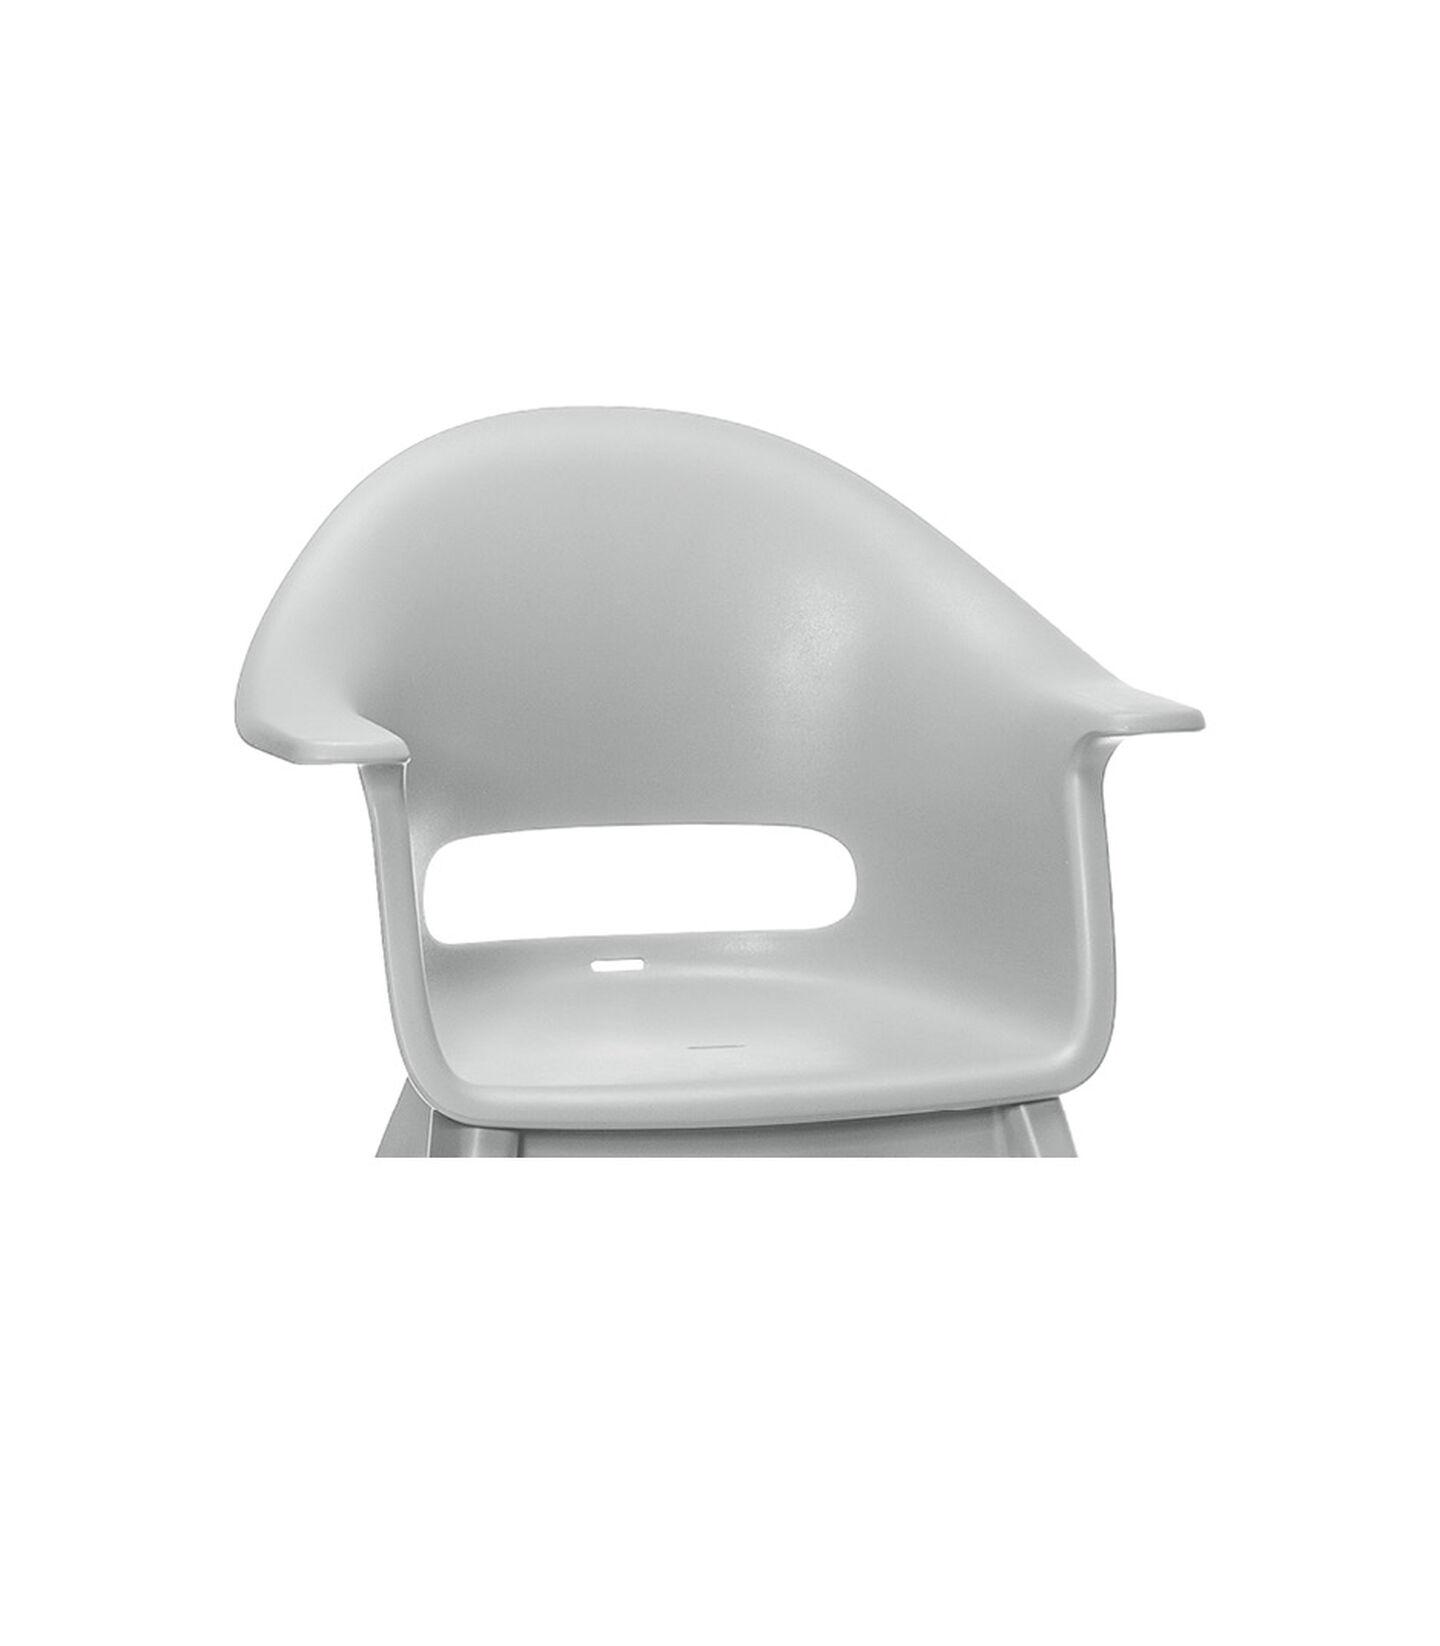 Stokke® Clikk™ Sitz - Cloud Grey, Cloud Grey, mainview view 1